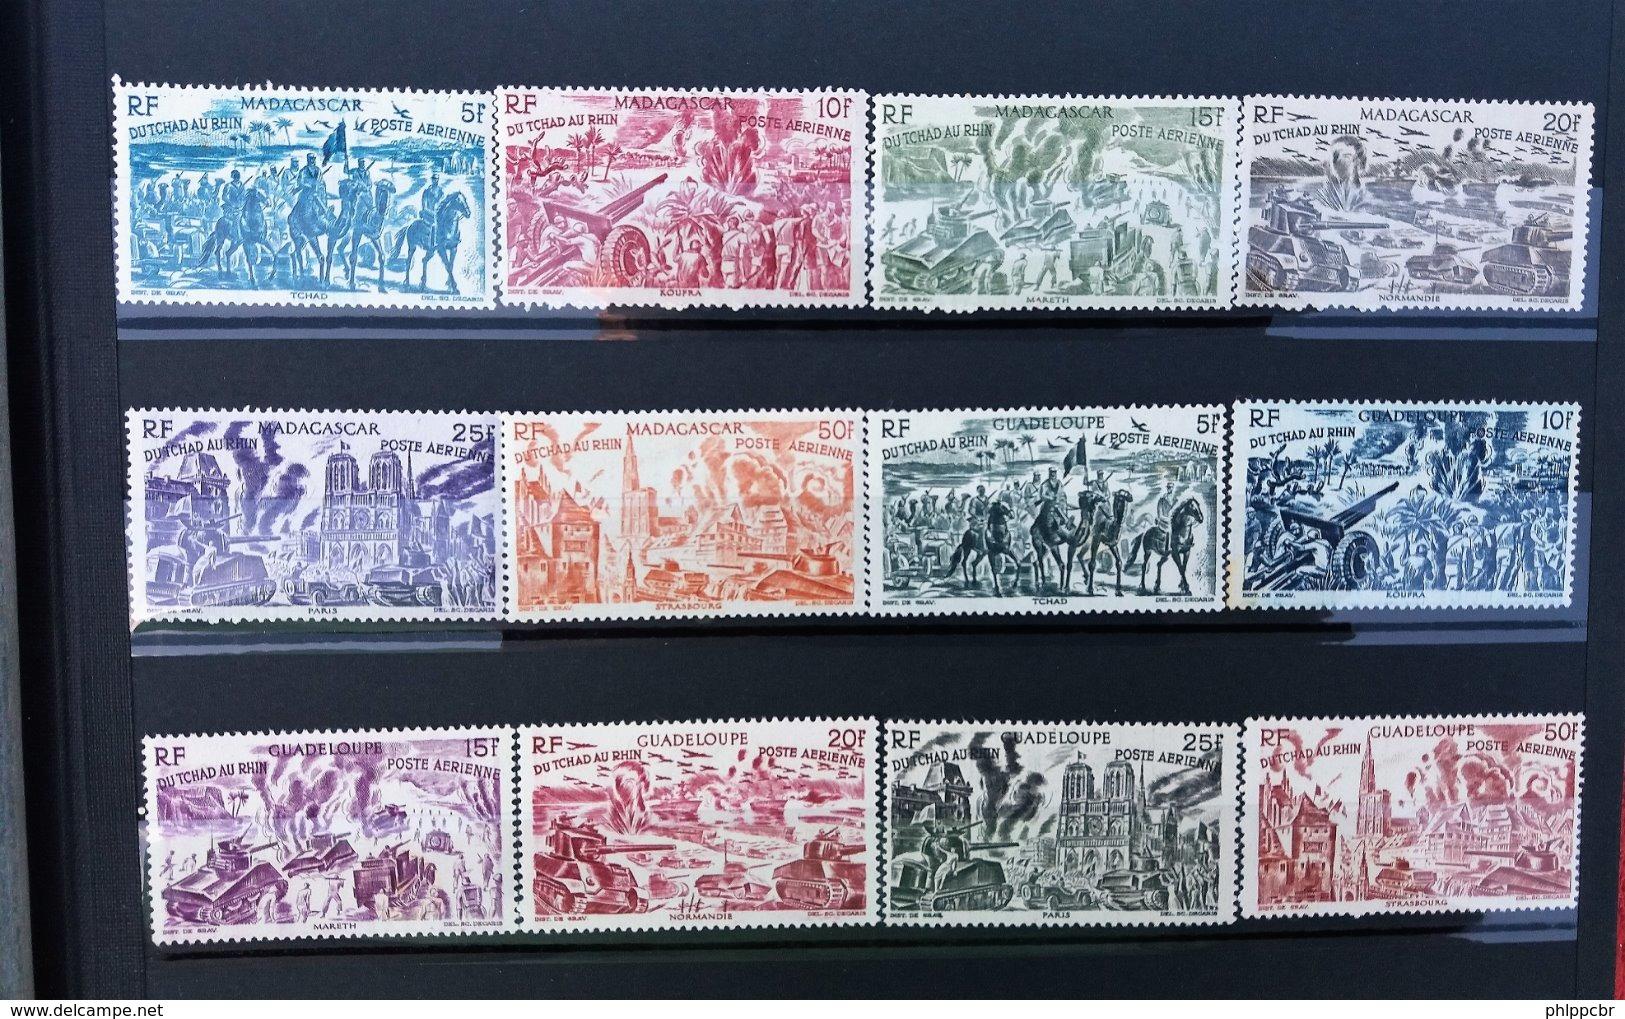 Importante Collection Colonies - Séries Coloniales - Grande Majorité ** - Plus De 2900 € De Cote Yvert - France (former Colonies & Protectorates)